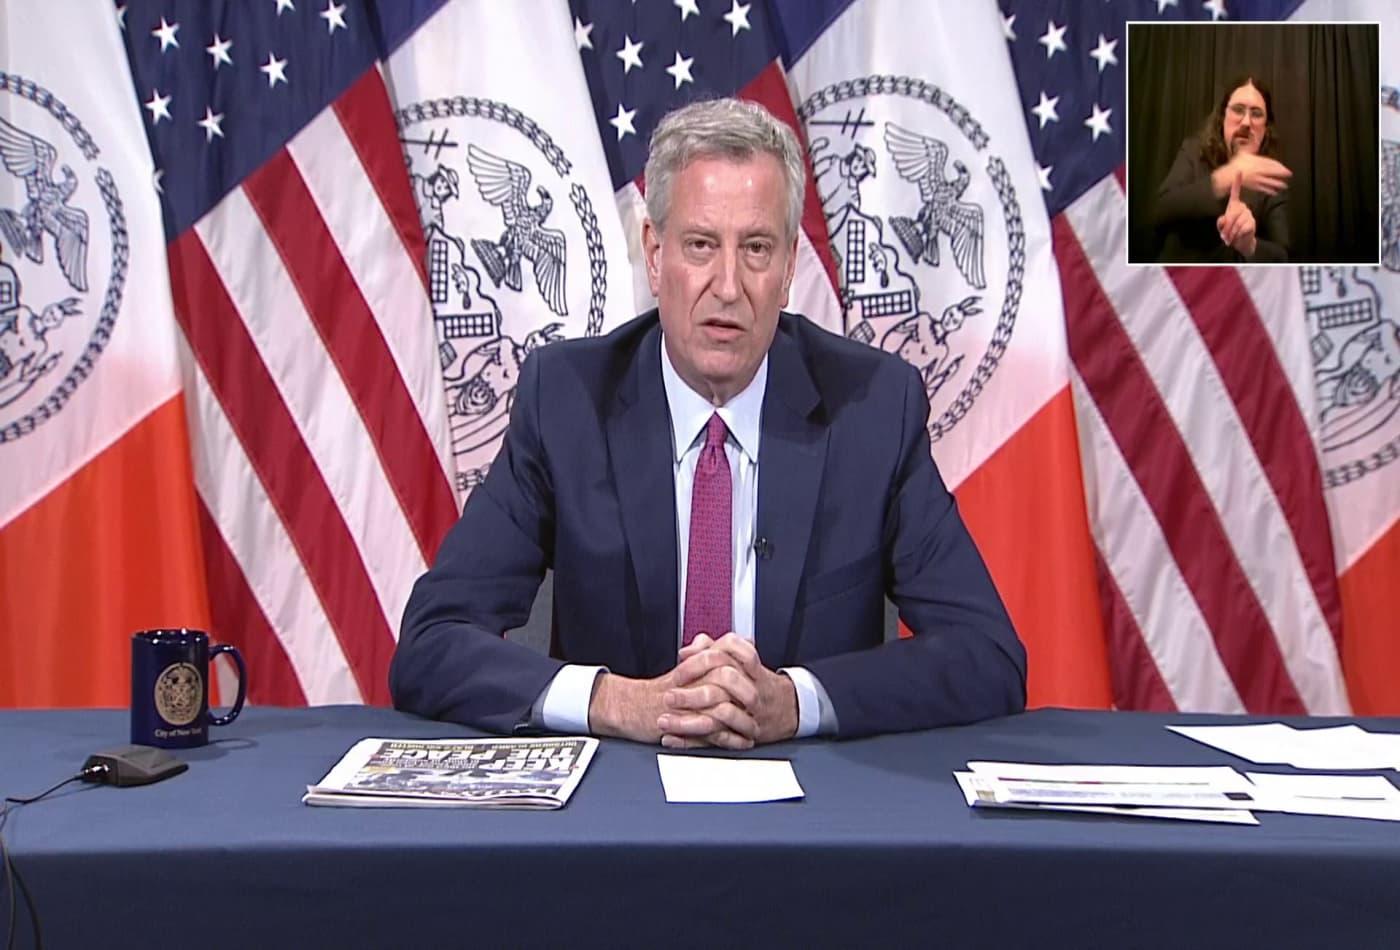 New York Mayor Bill de Blasio calls for investigation into police misconduct